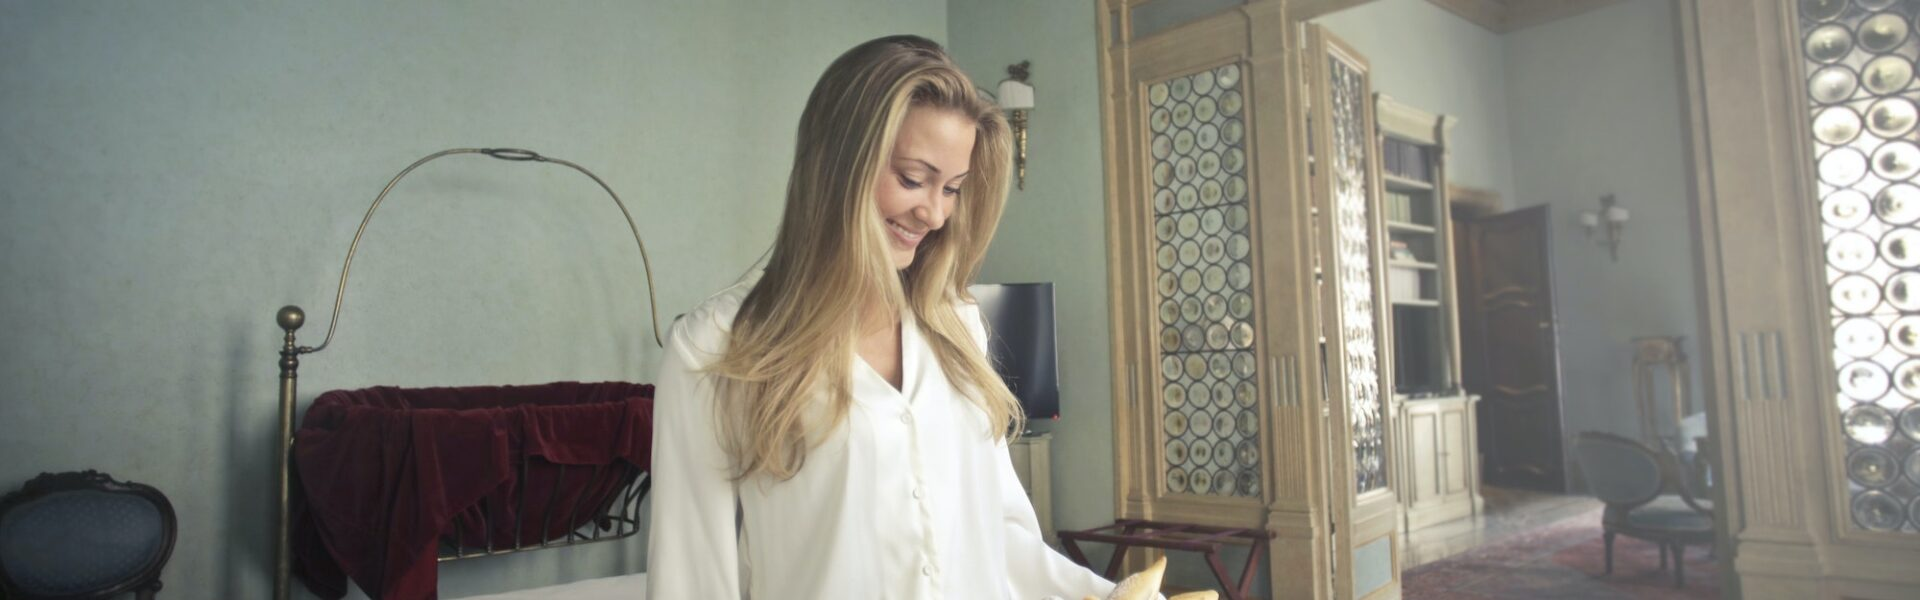 Why Choose a Daylesford Luxury Accommodation? | Luxury Travel Guide | Elle Blonde Luxury Lifestyle Destination Blog